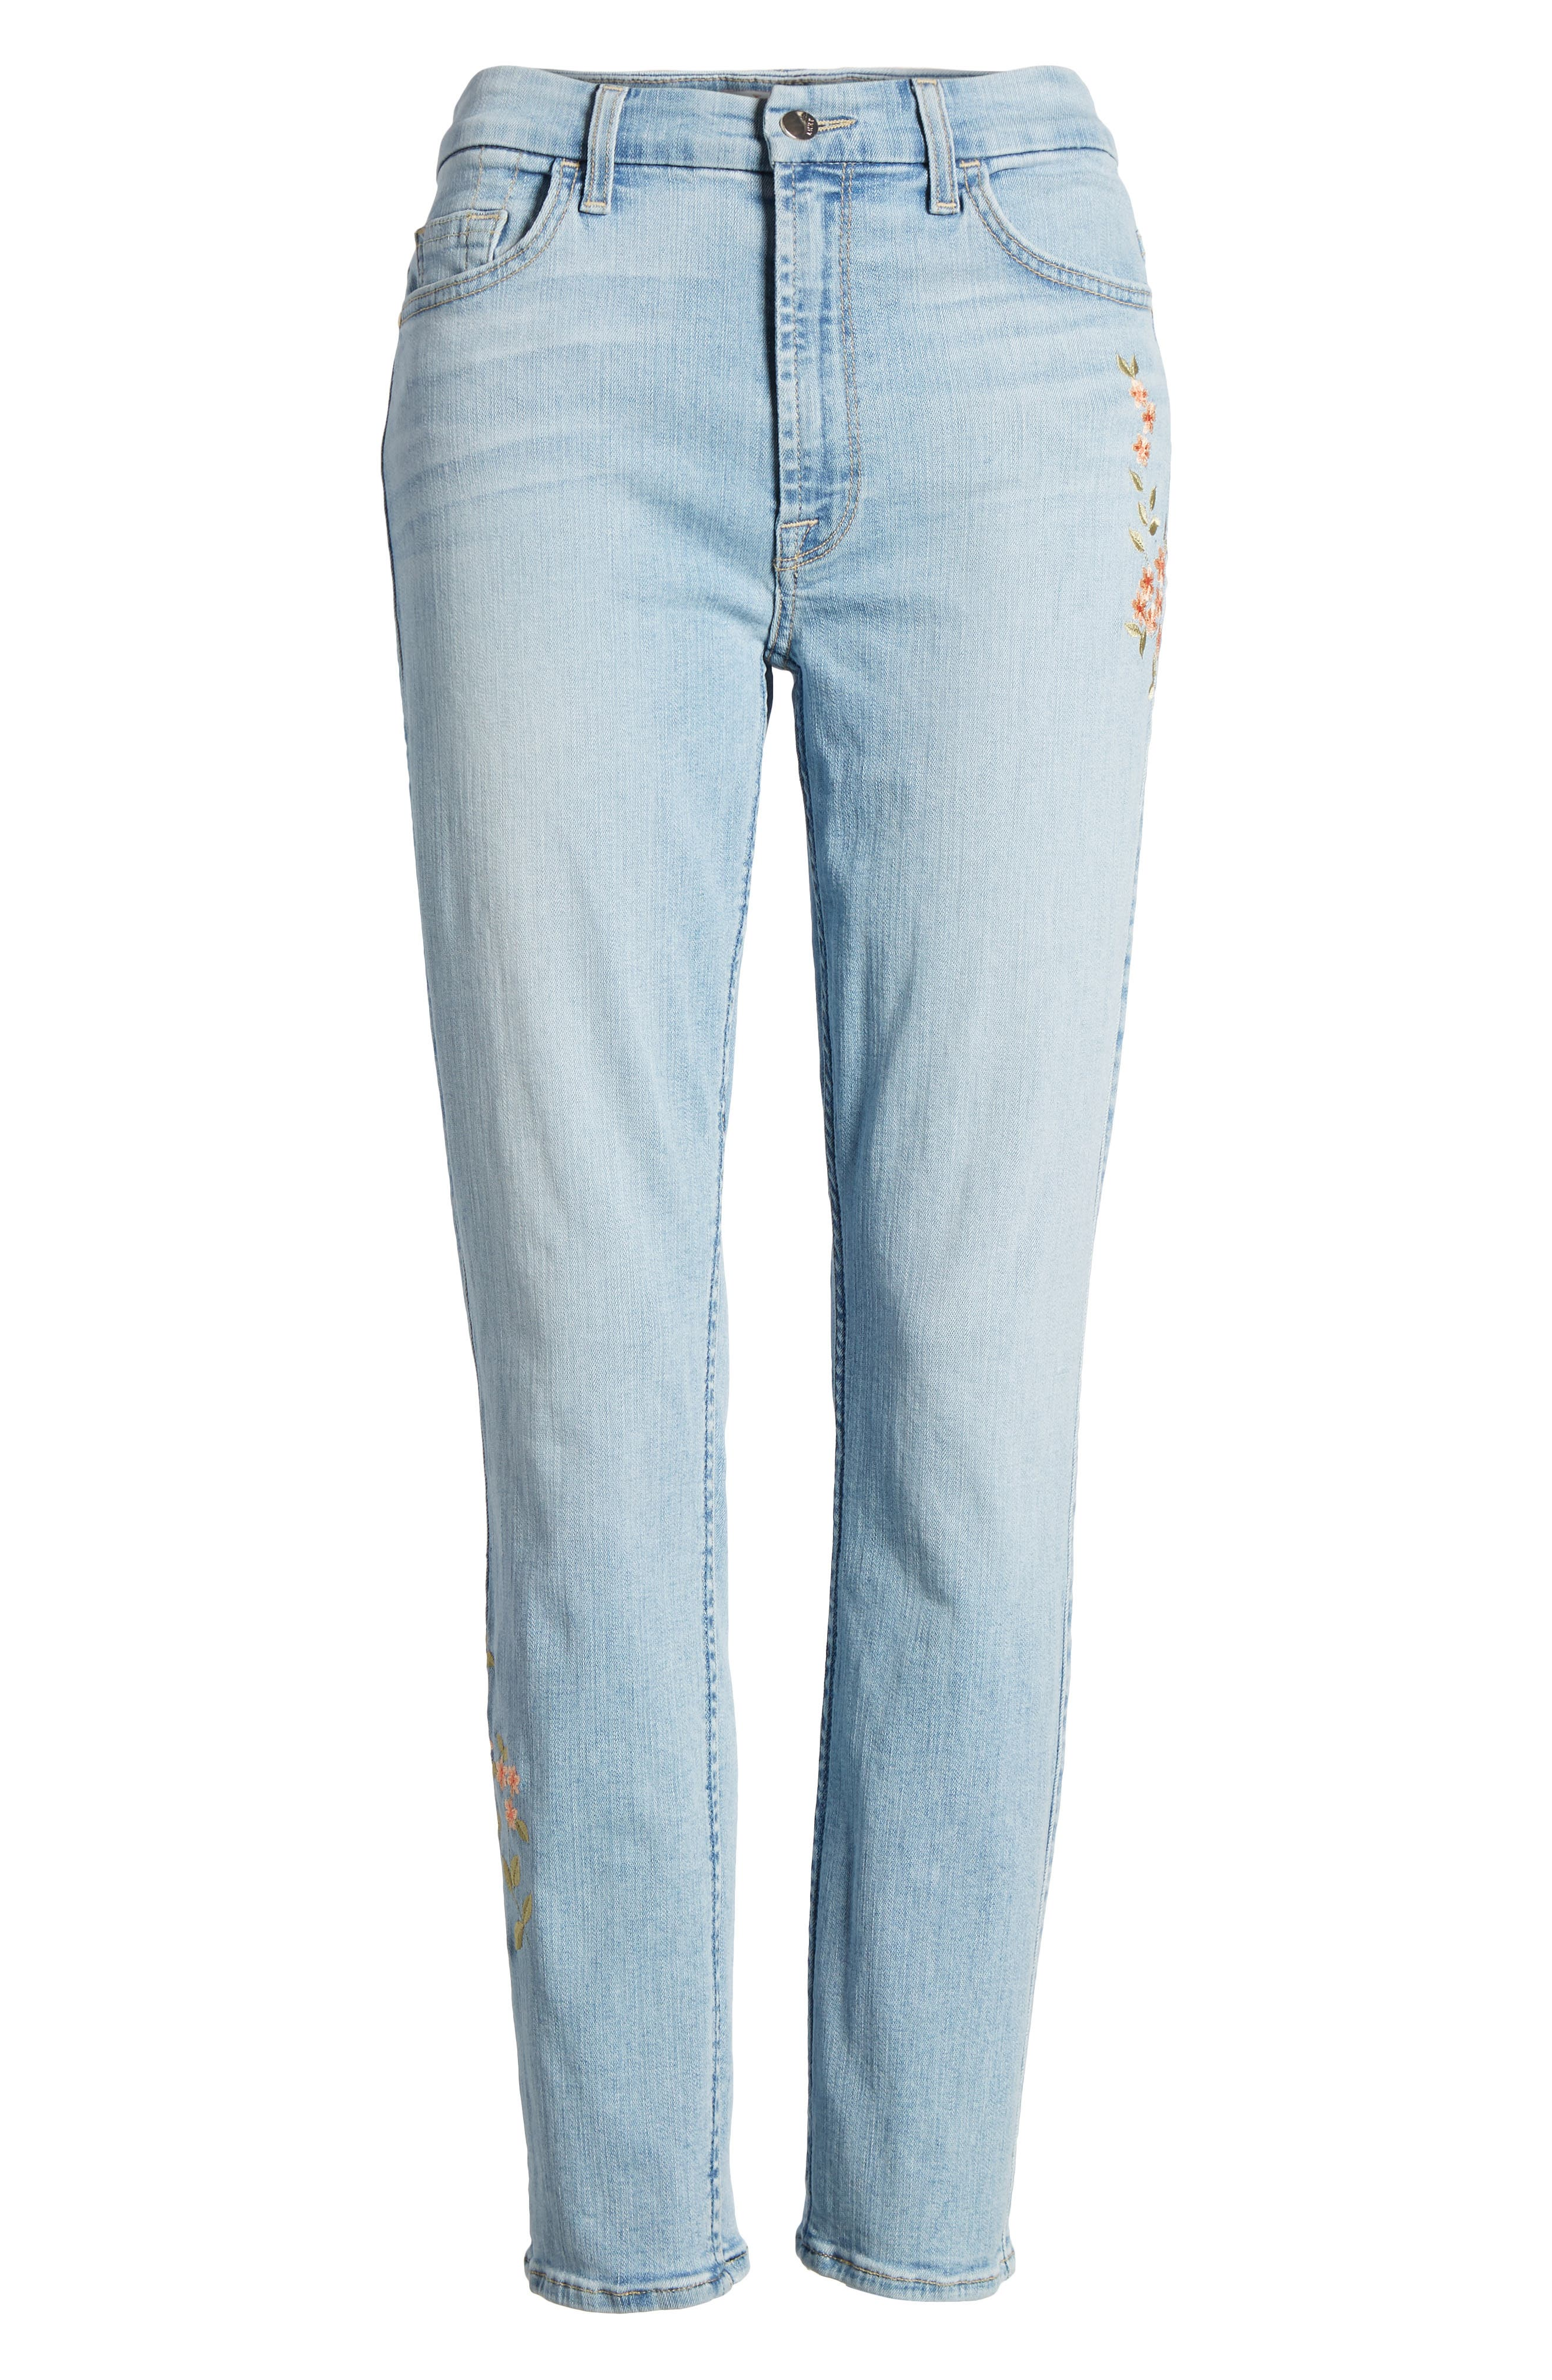 Embroidered Slim Boyfriend Jeans,                             Alternate thumbnail 7, color,                             Riche Touch Playa Vista